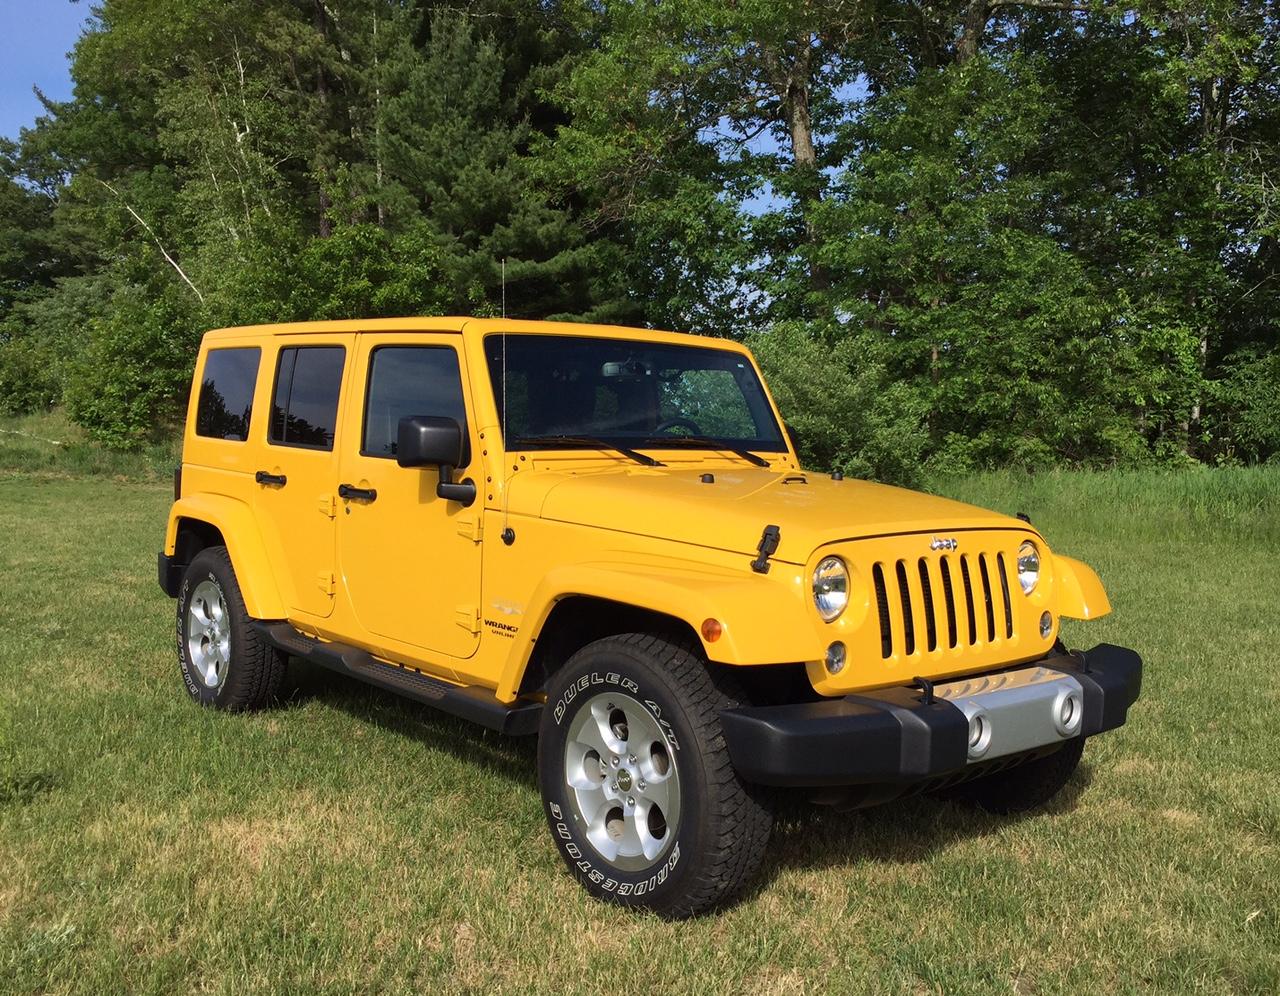 2015 Jeep Wrangler Unlimited Sahara 4x4 Front Quarter